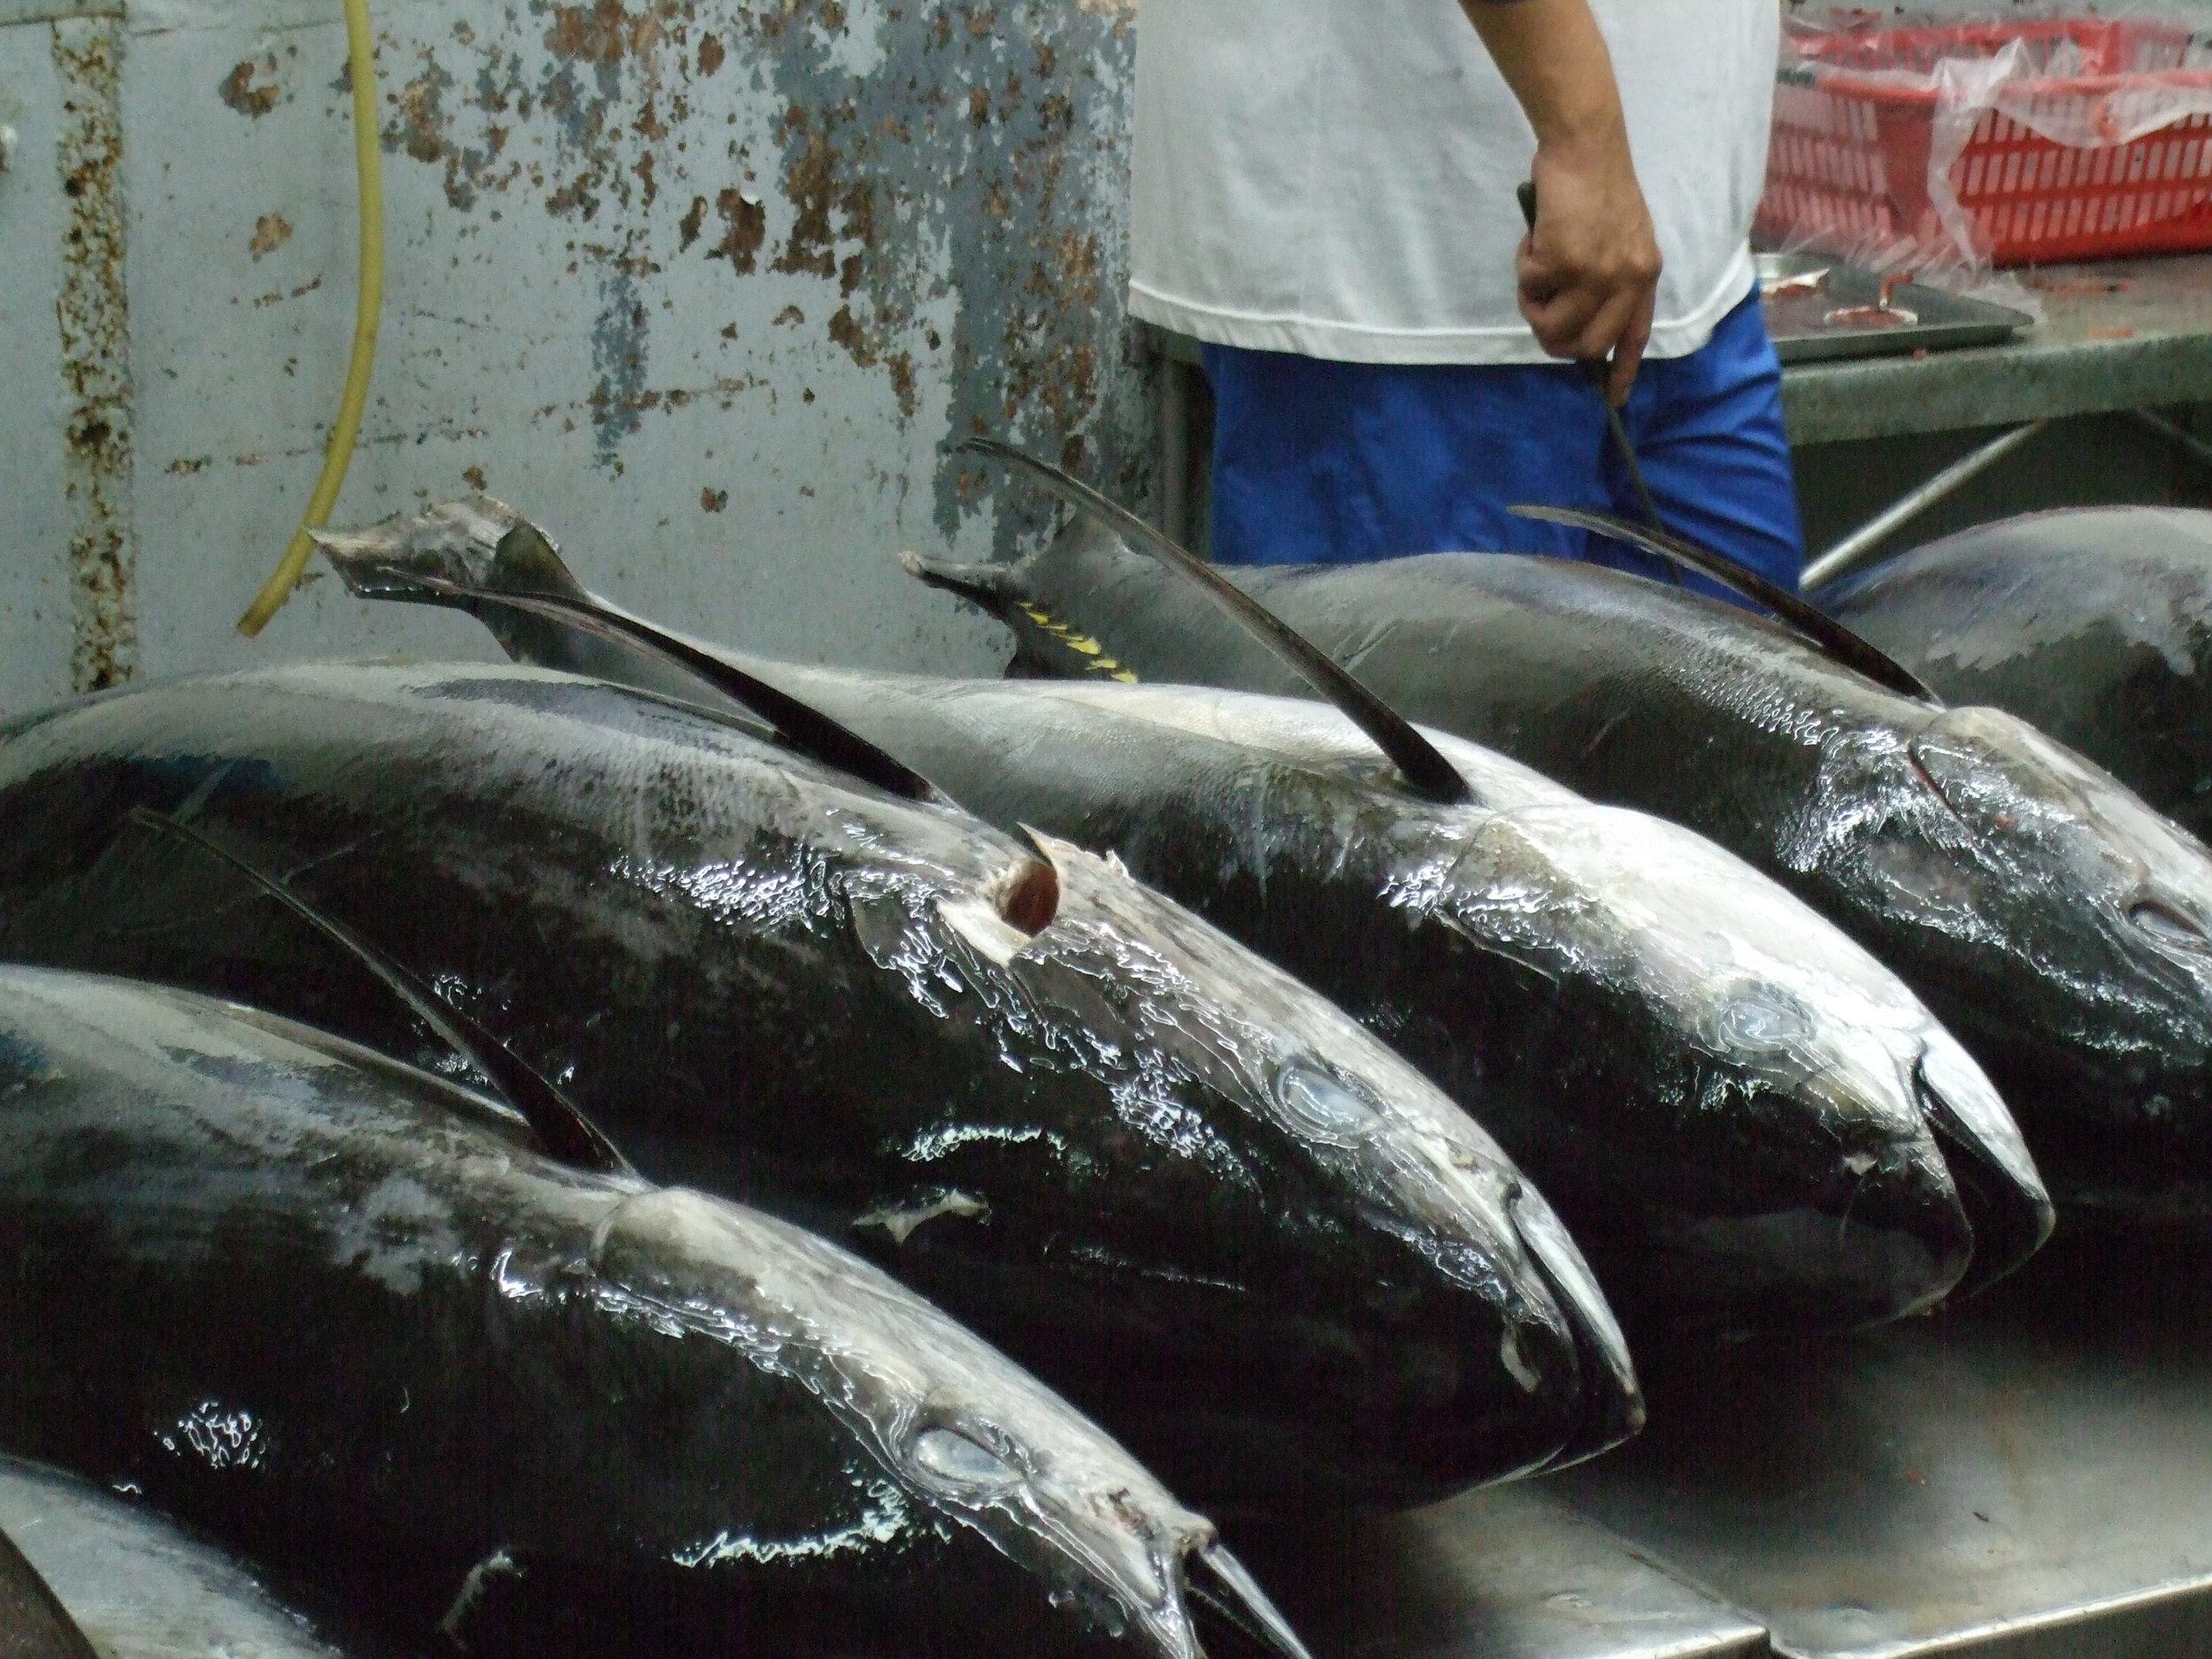 The Philippines 033.JPG